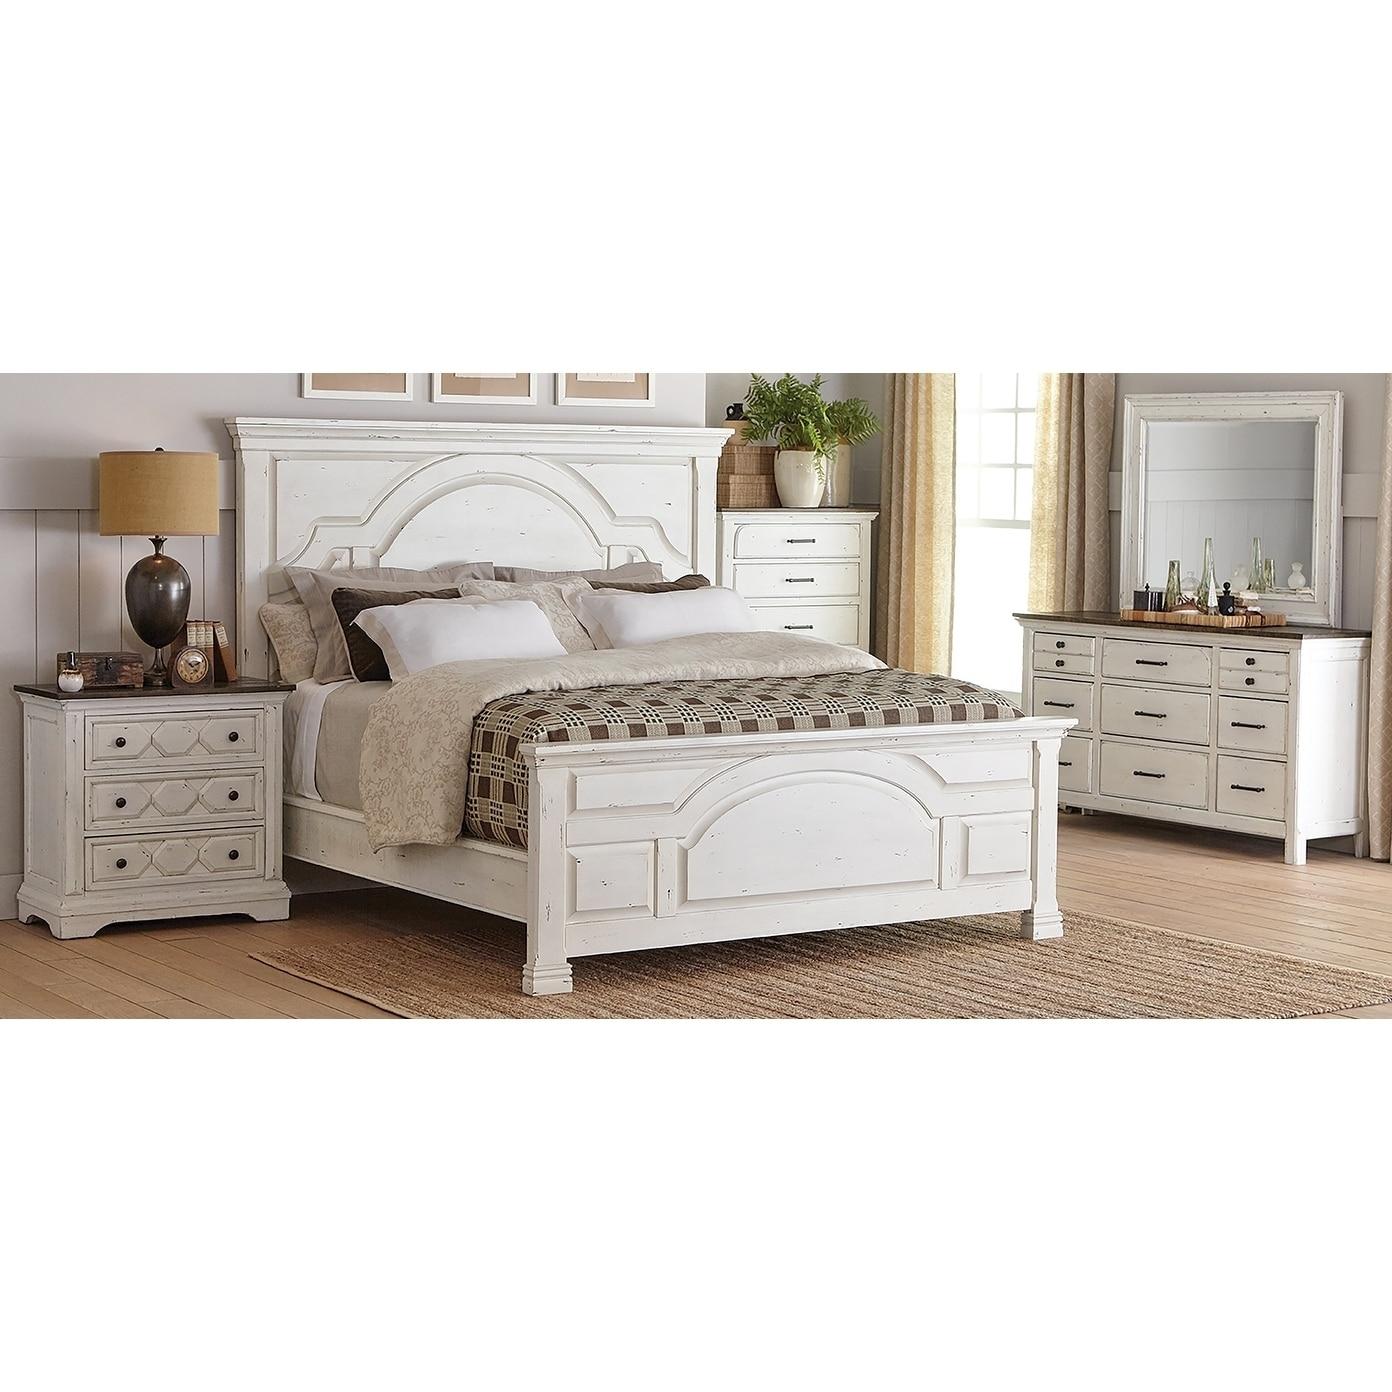 Danica Vintage White 5-piece Panel Bedroom Set with 2 Nightstands